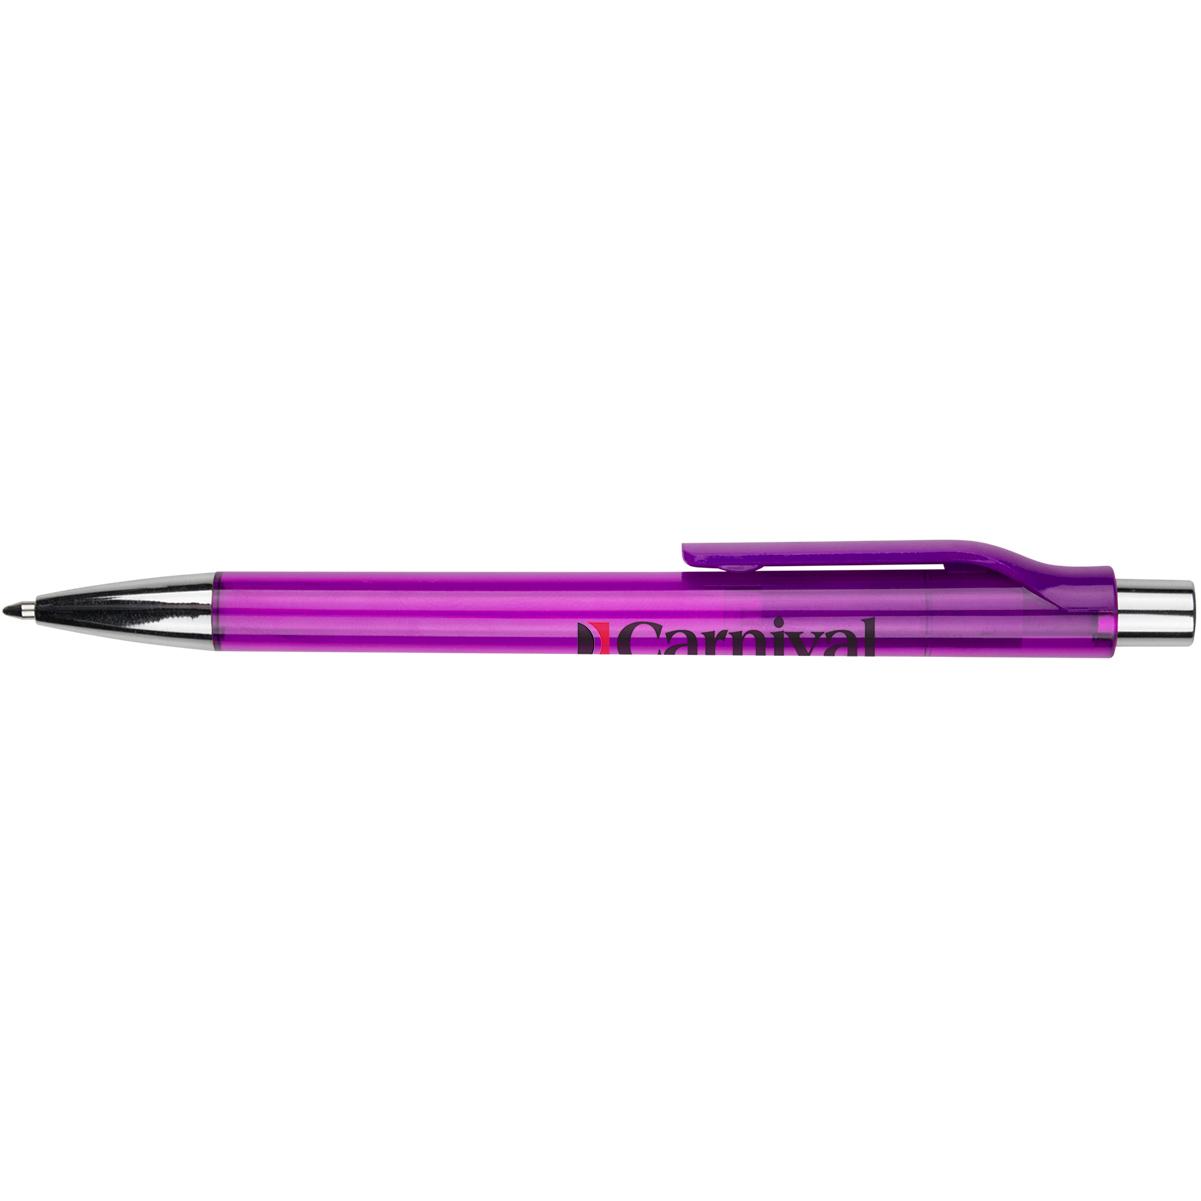 Kalf Translucent Pen